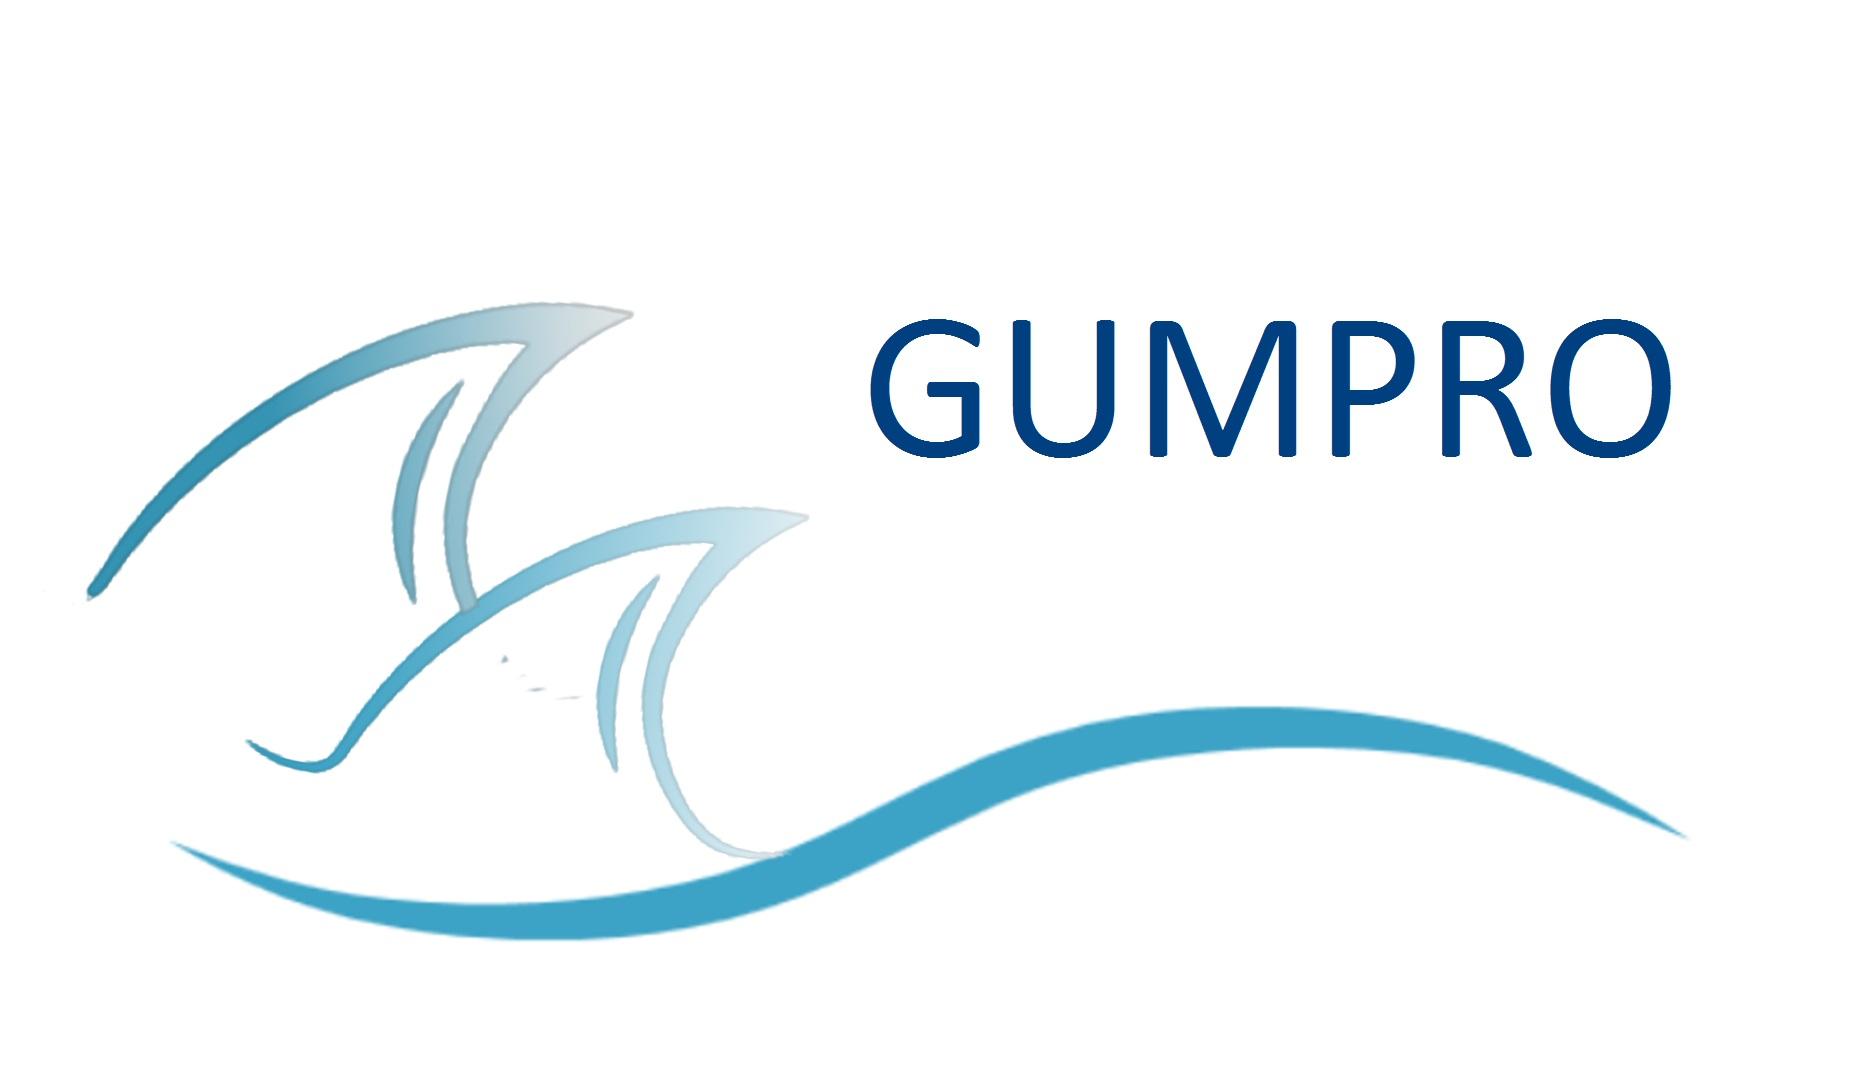 GUMPRO - Kantenschutzprofile-Logo